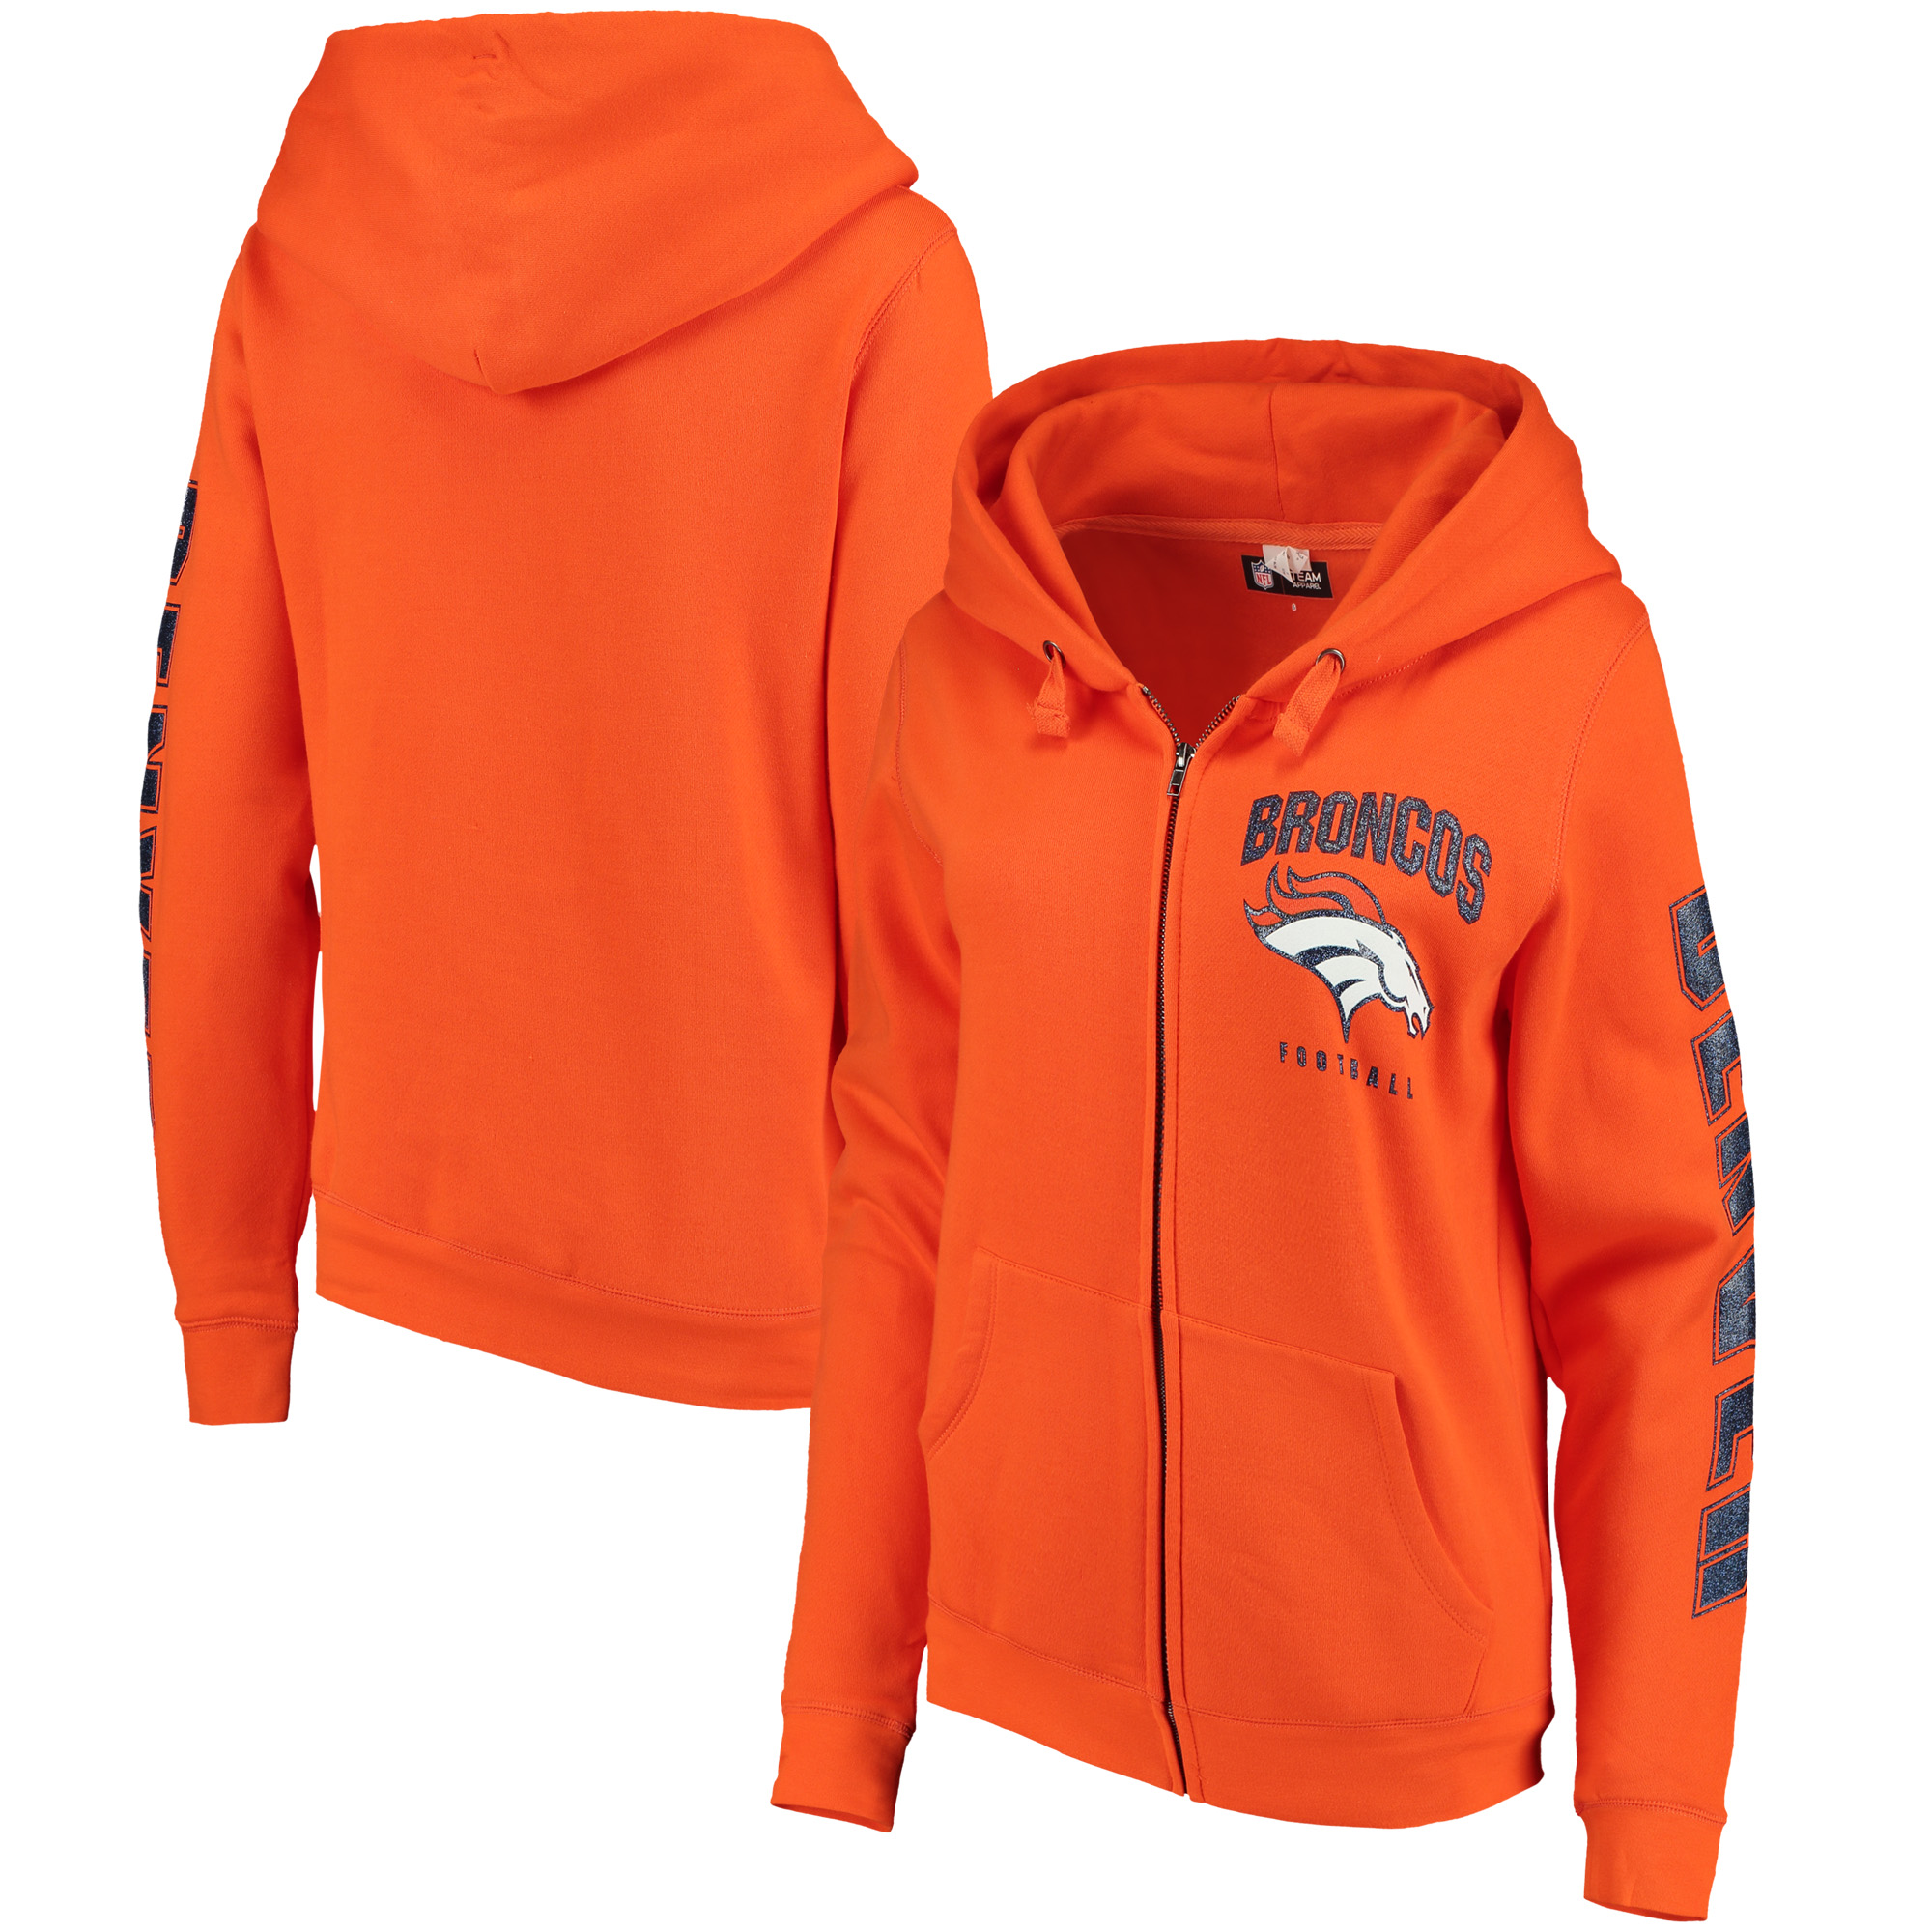 Denver Broncos New Era Women's Playbook Glitter Sleeve Full-Zip Hoodie - Orange